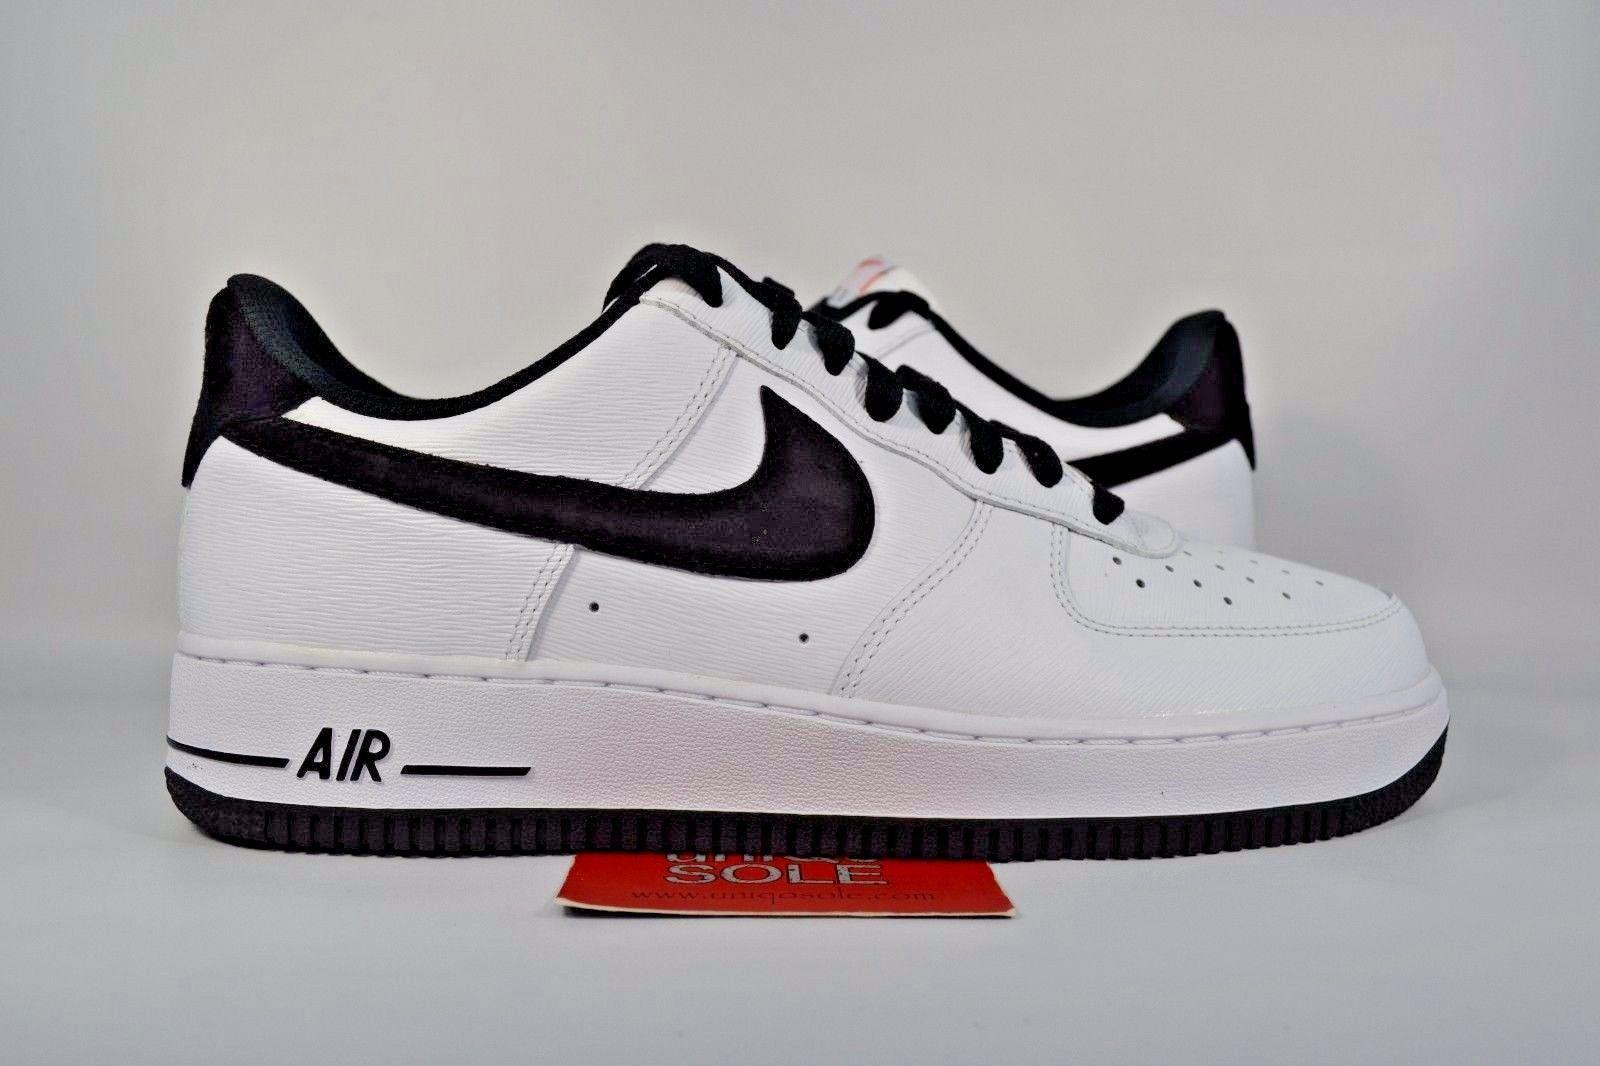 NEW Nike Air Force 1 Low WHITE BLACK 488298 152 sz 10.5